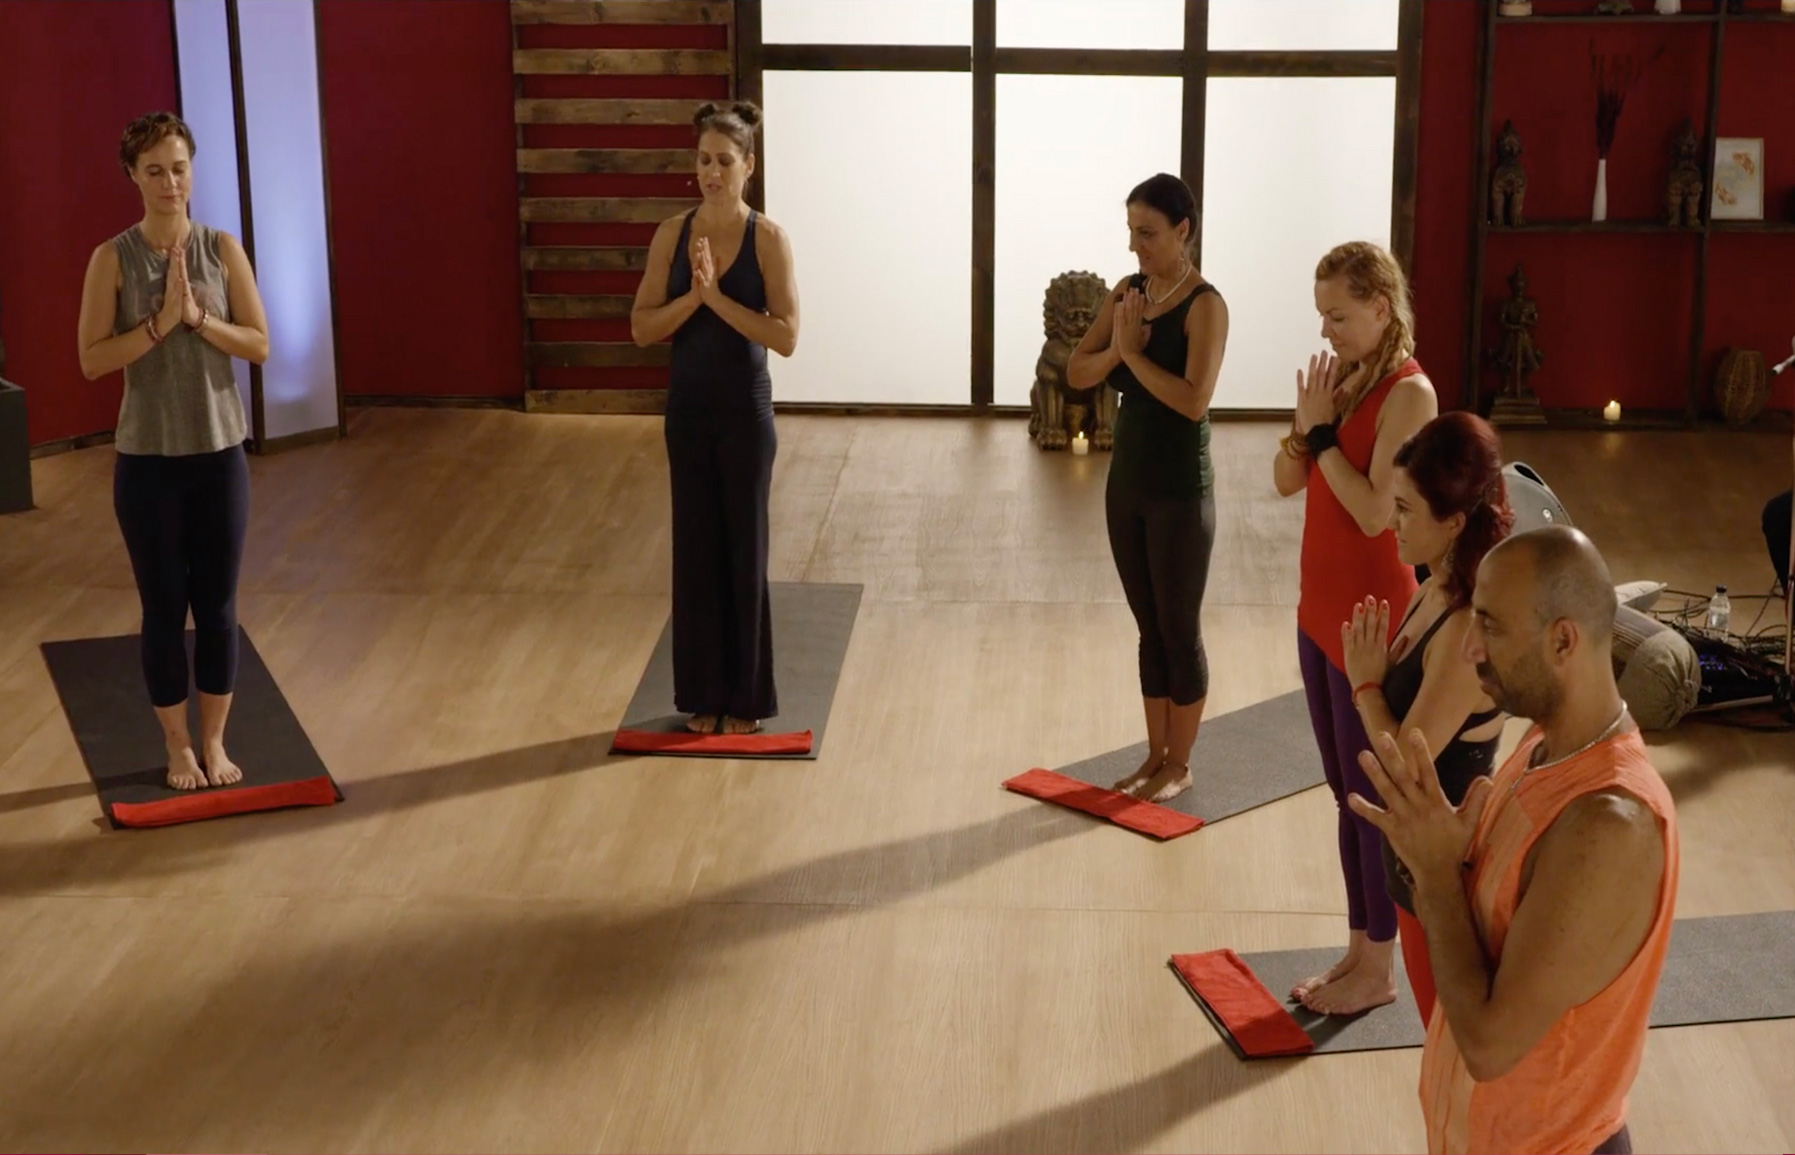 UDAYA Classes for Beginners - Make use of 5 minute asana tutorials